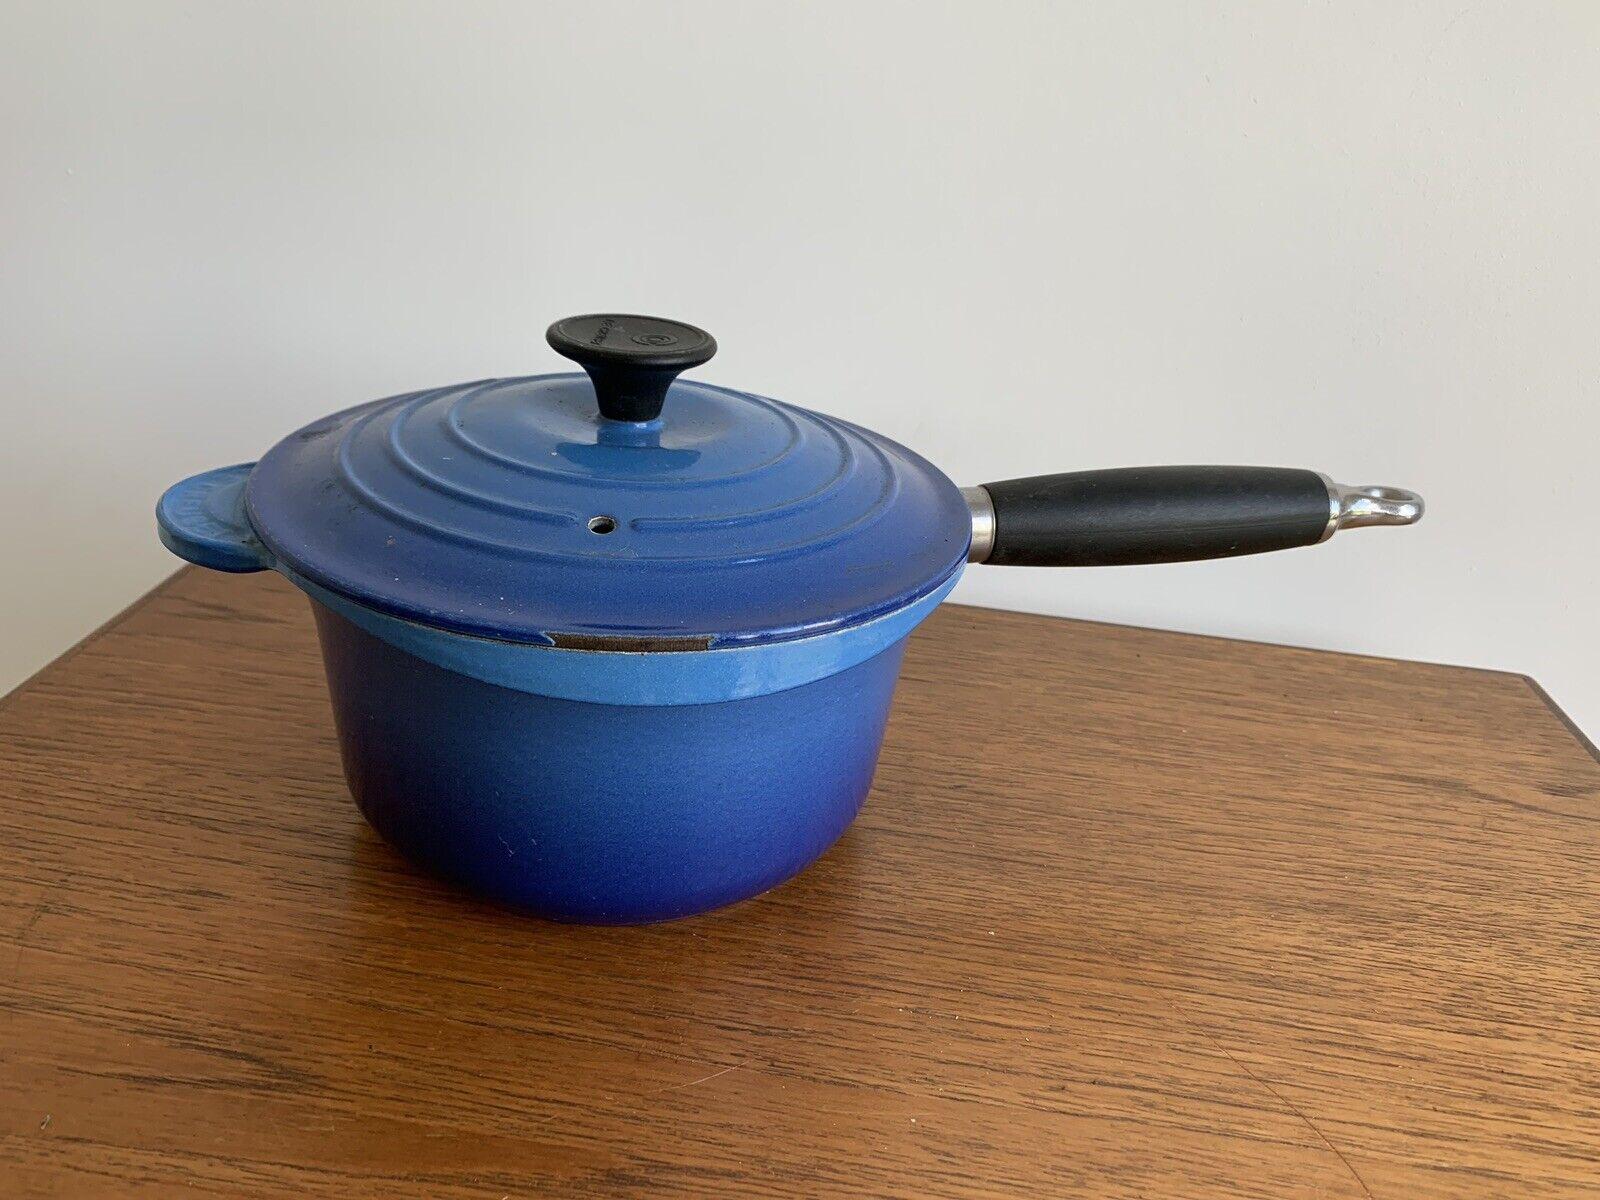 Le creuset bluee Saucepan Size 18